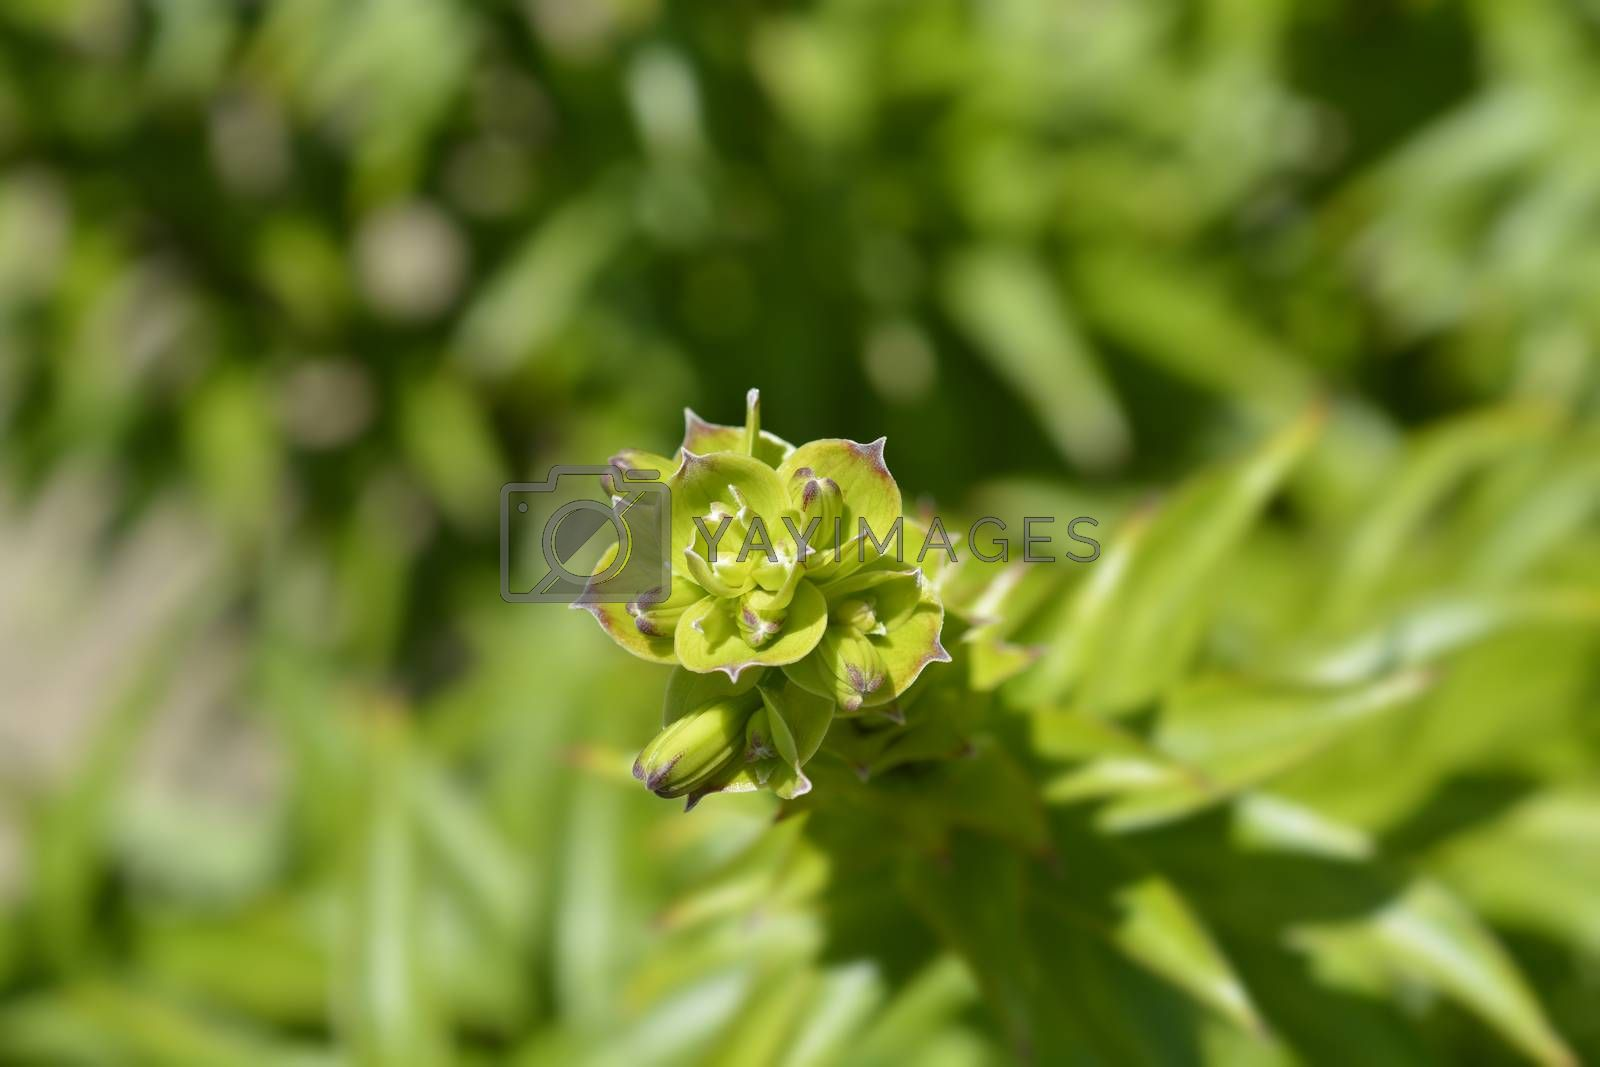 Henrys lily flower buds - Latin name - Lilium henryi